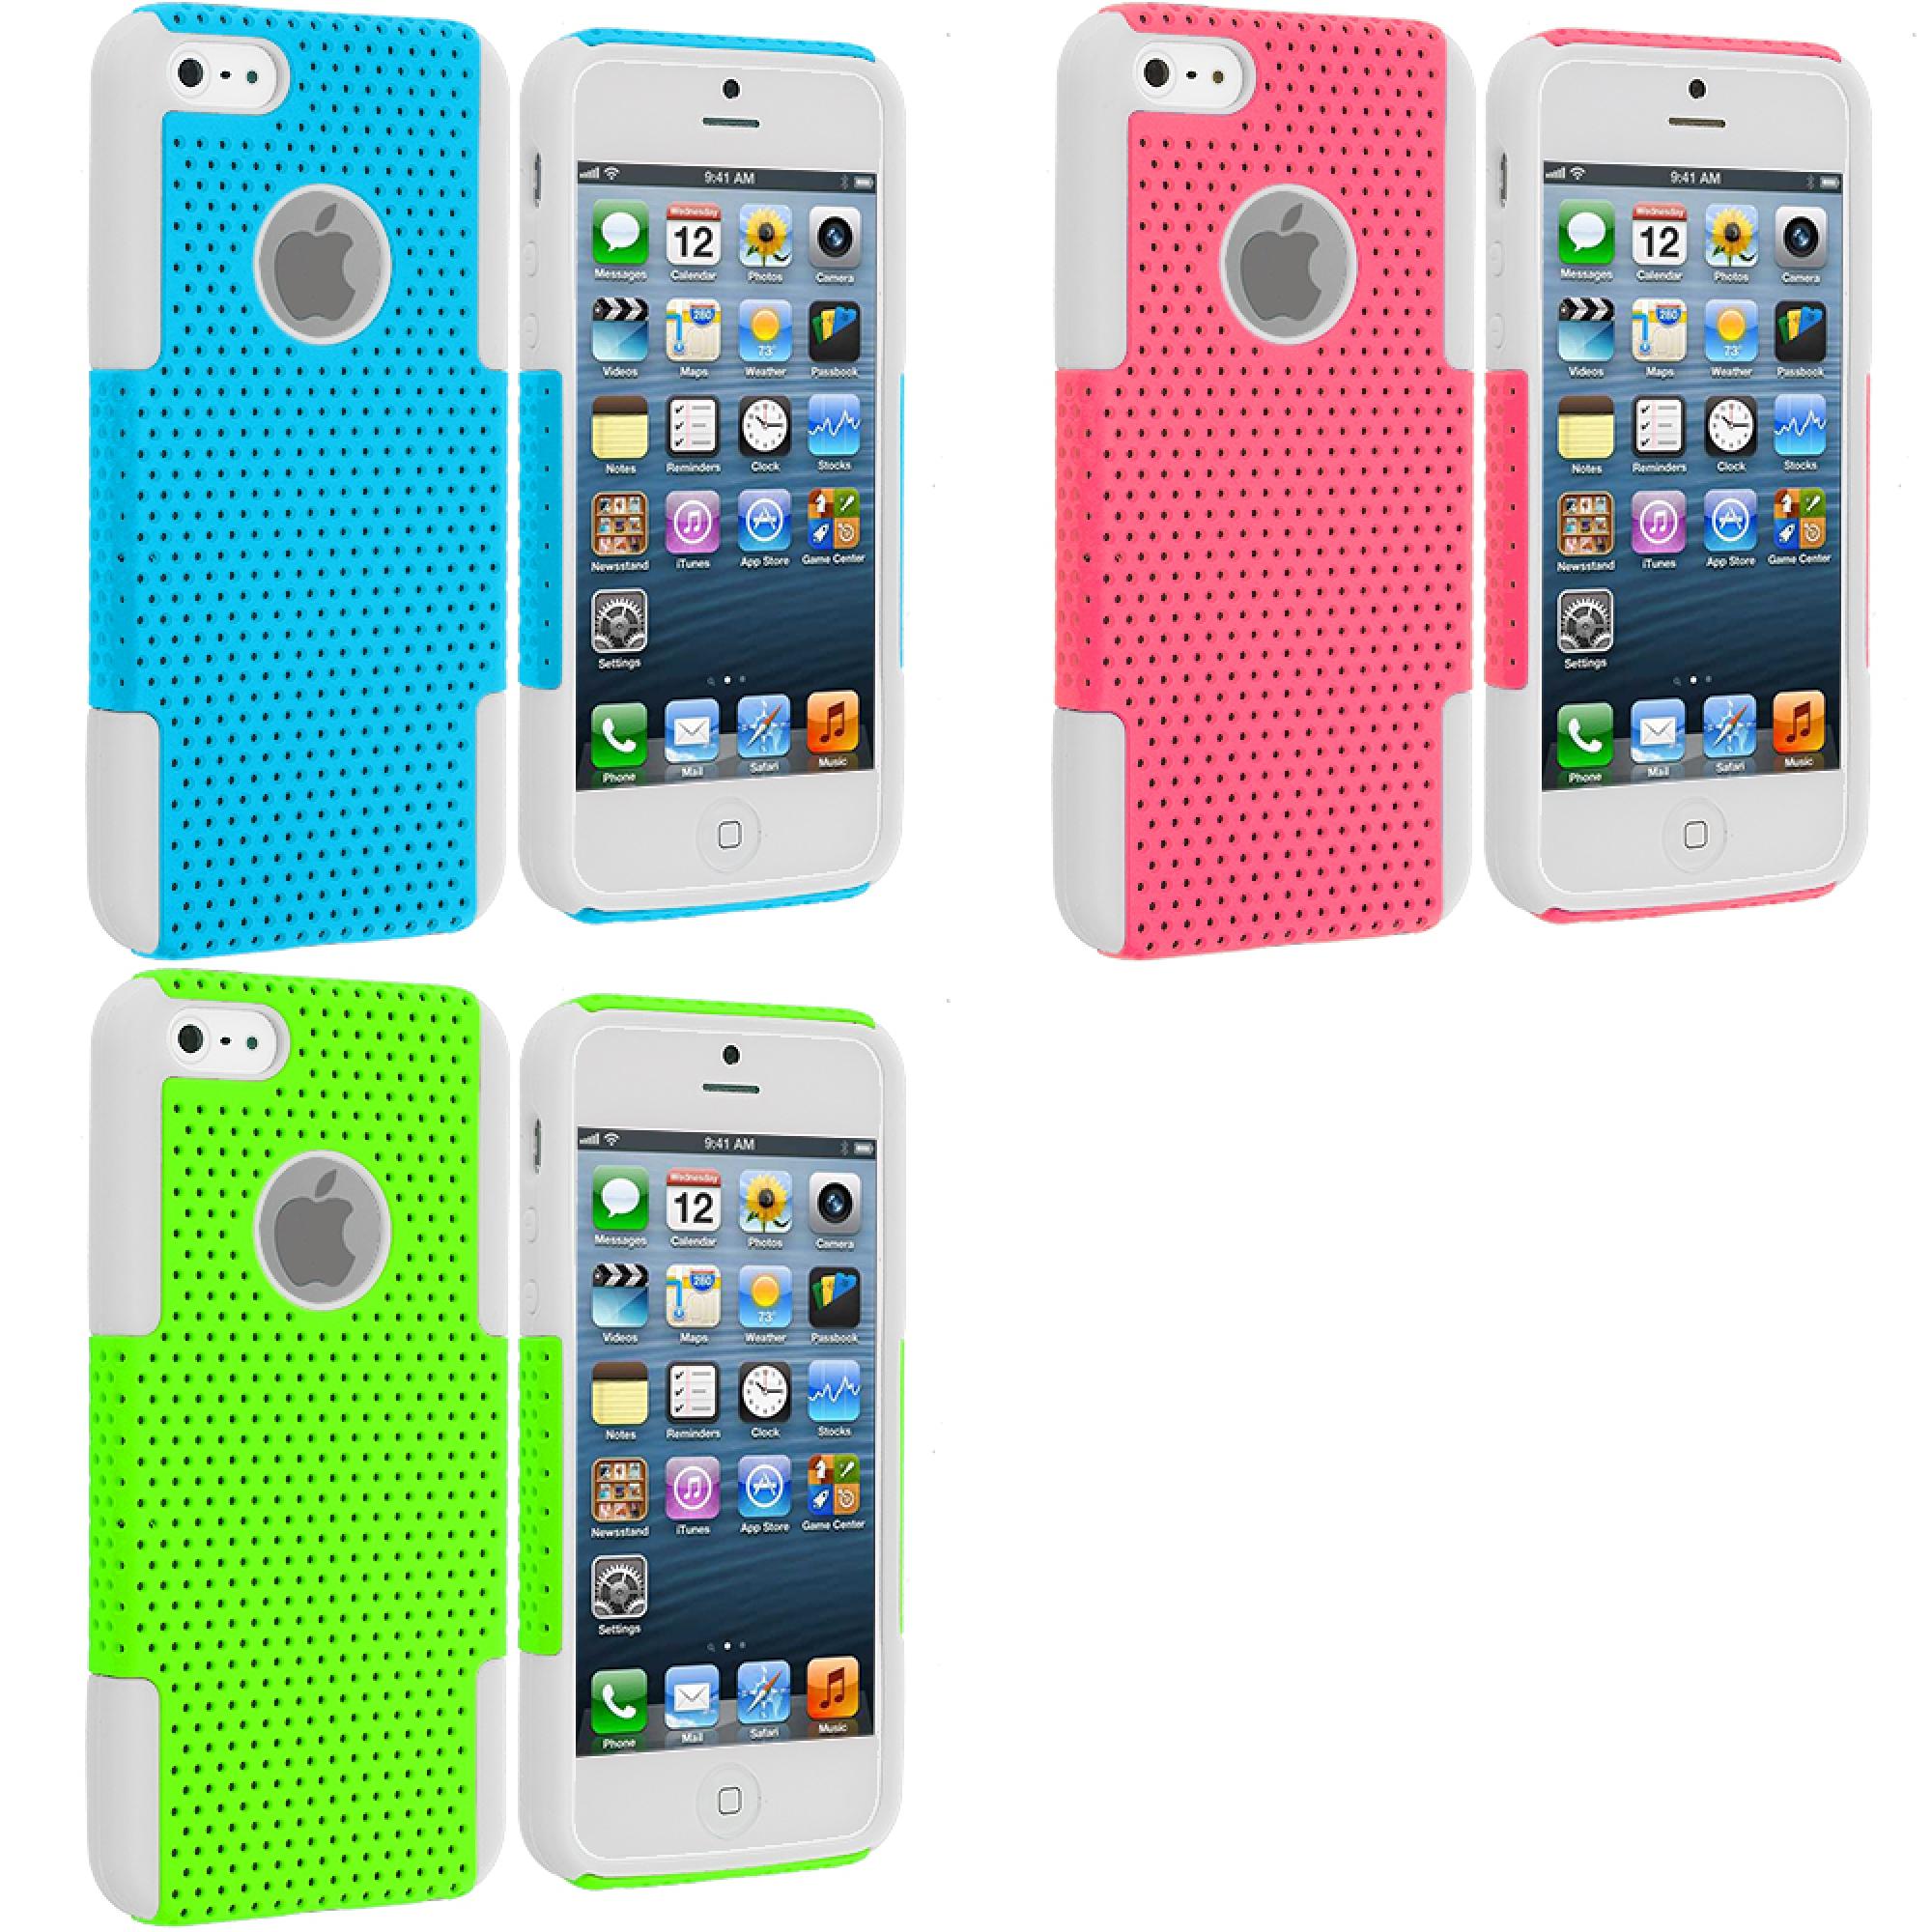 Apple iPhone 5/5S/SE Combo Pack : White / Baby Blue Hybrid Mesh Hard/Soft Case Cover